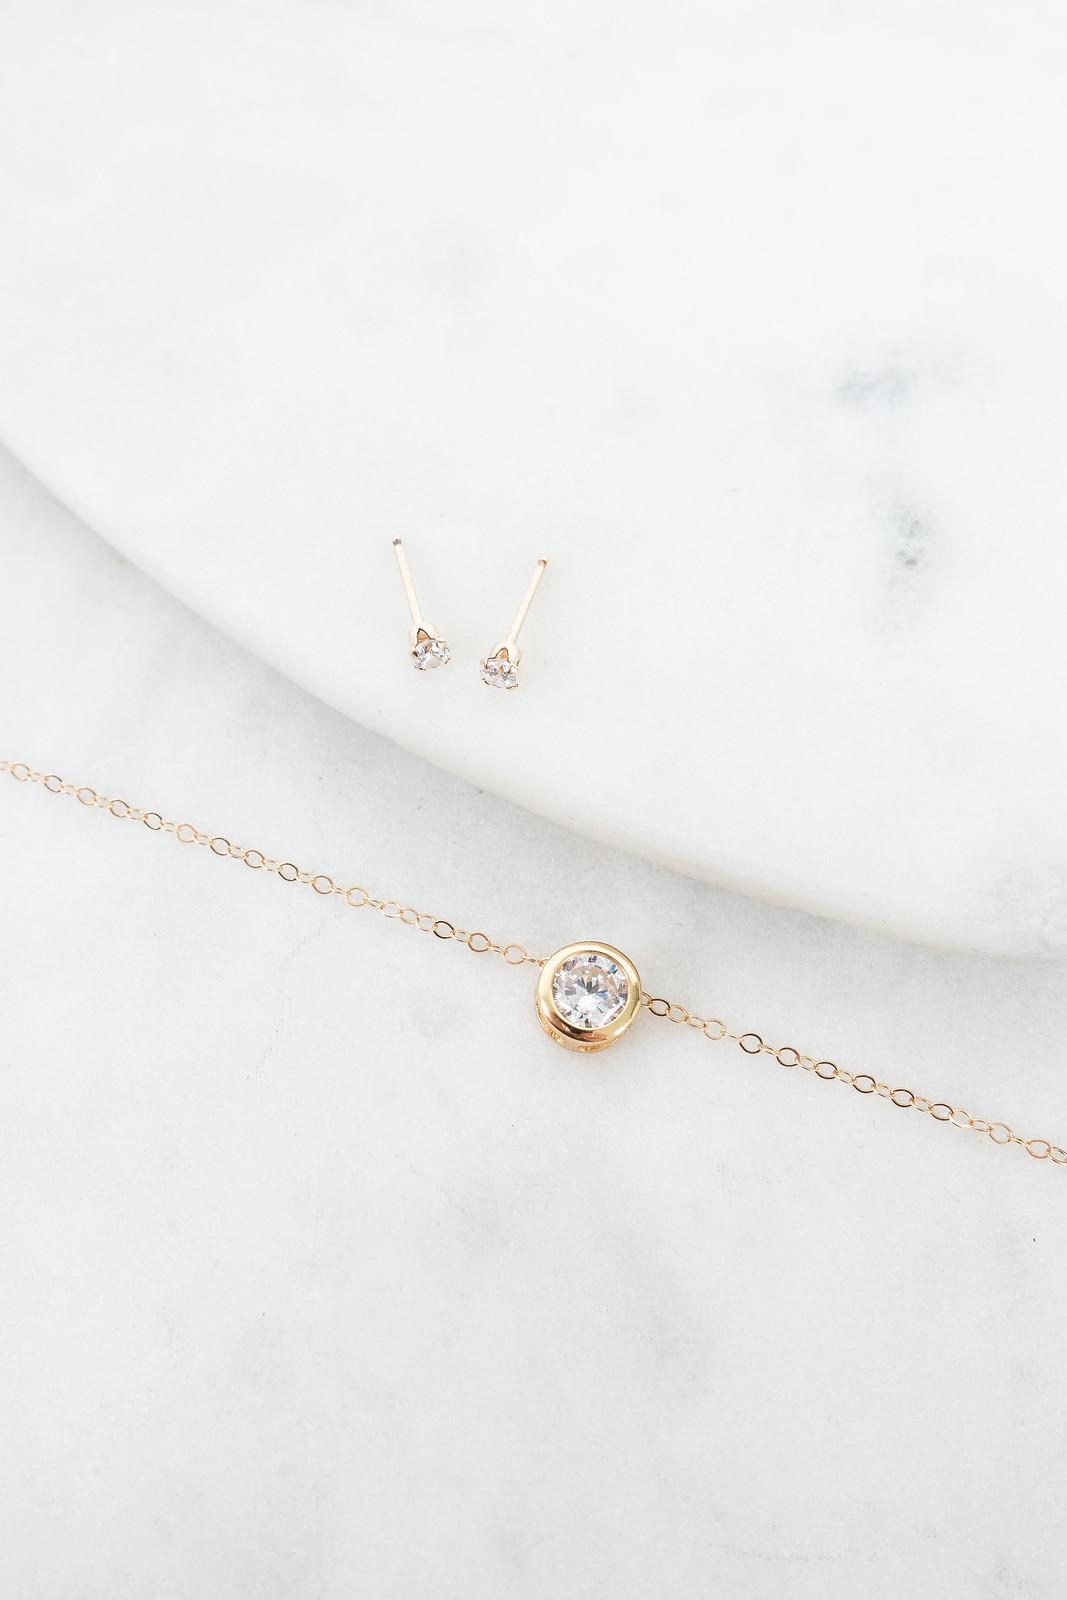 5 Occasions To Wear Diamond Jewellery